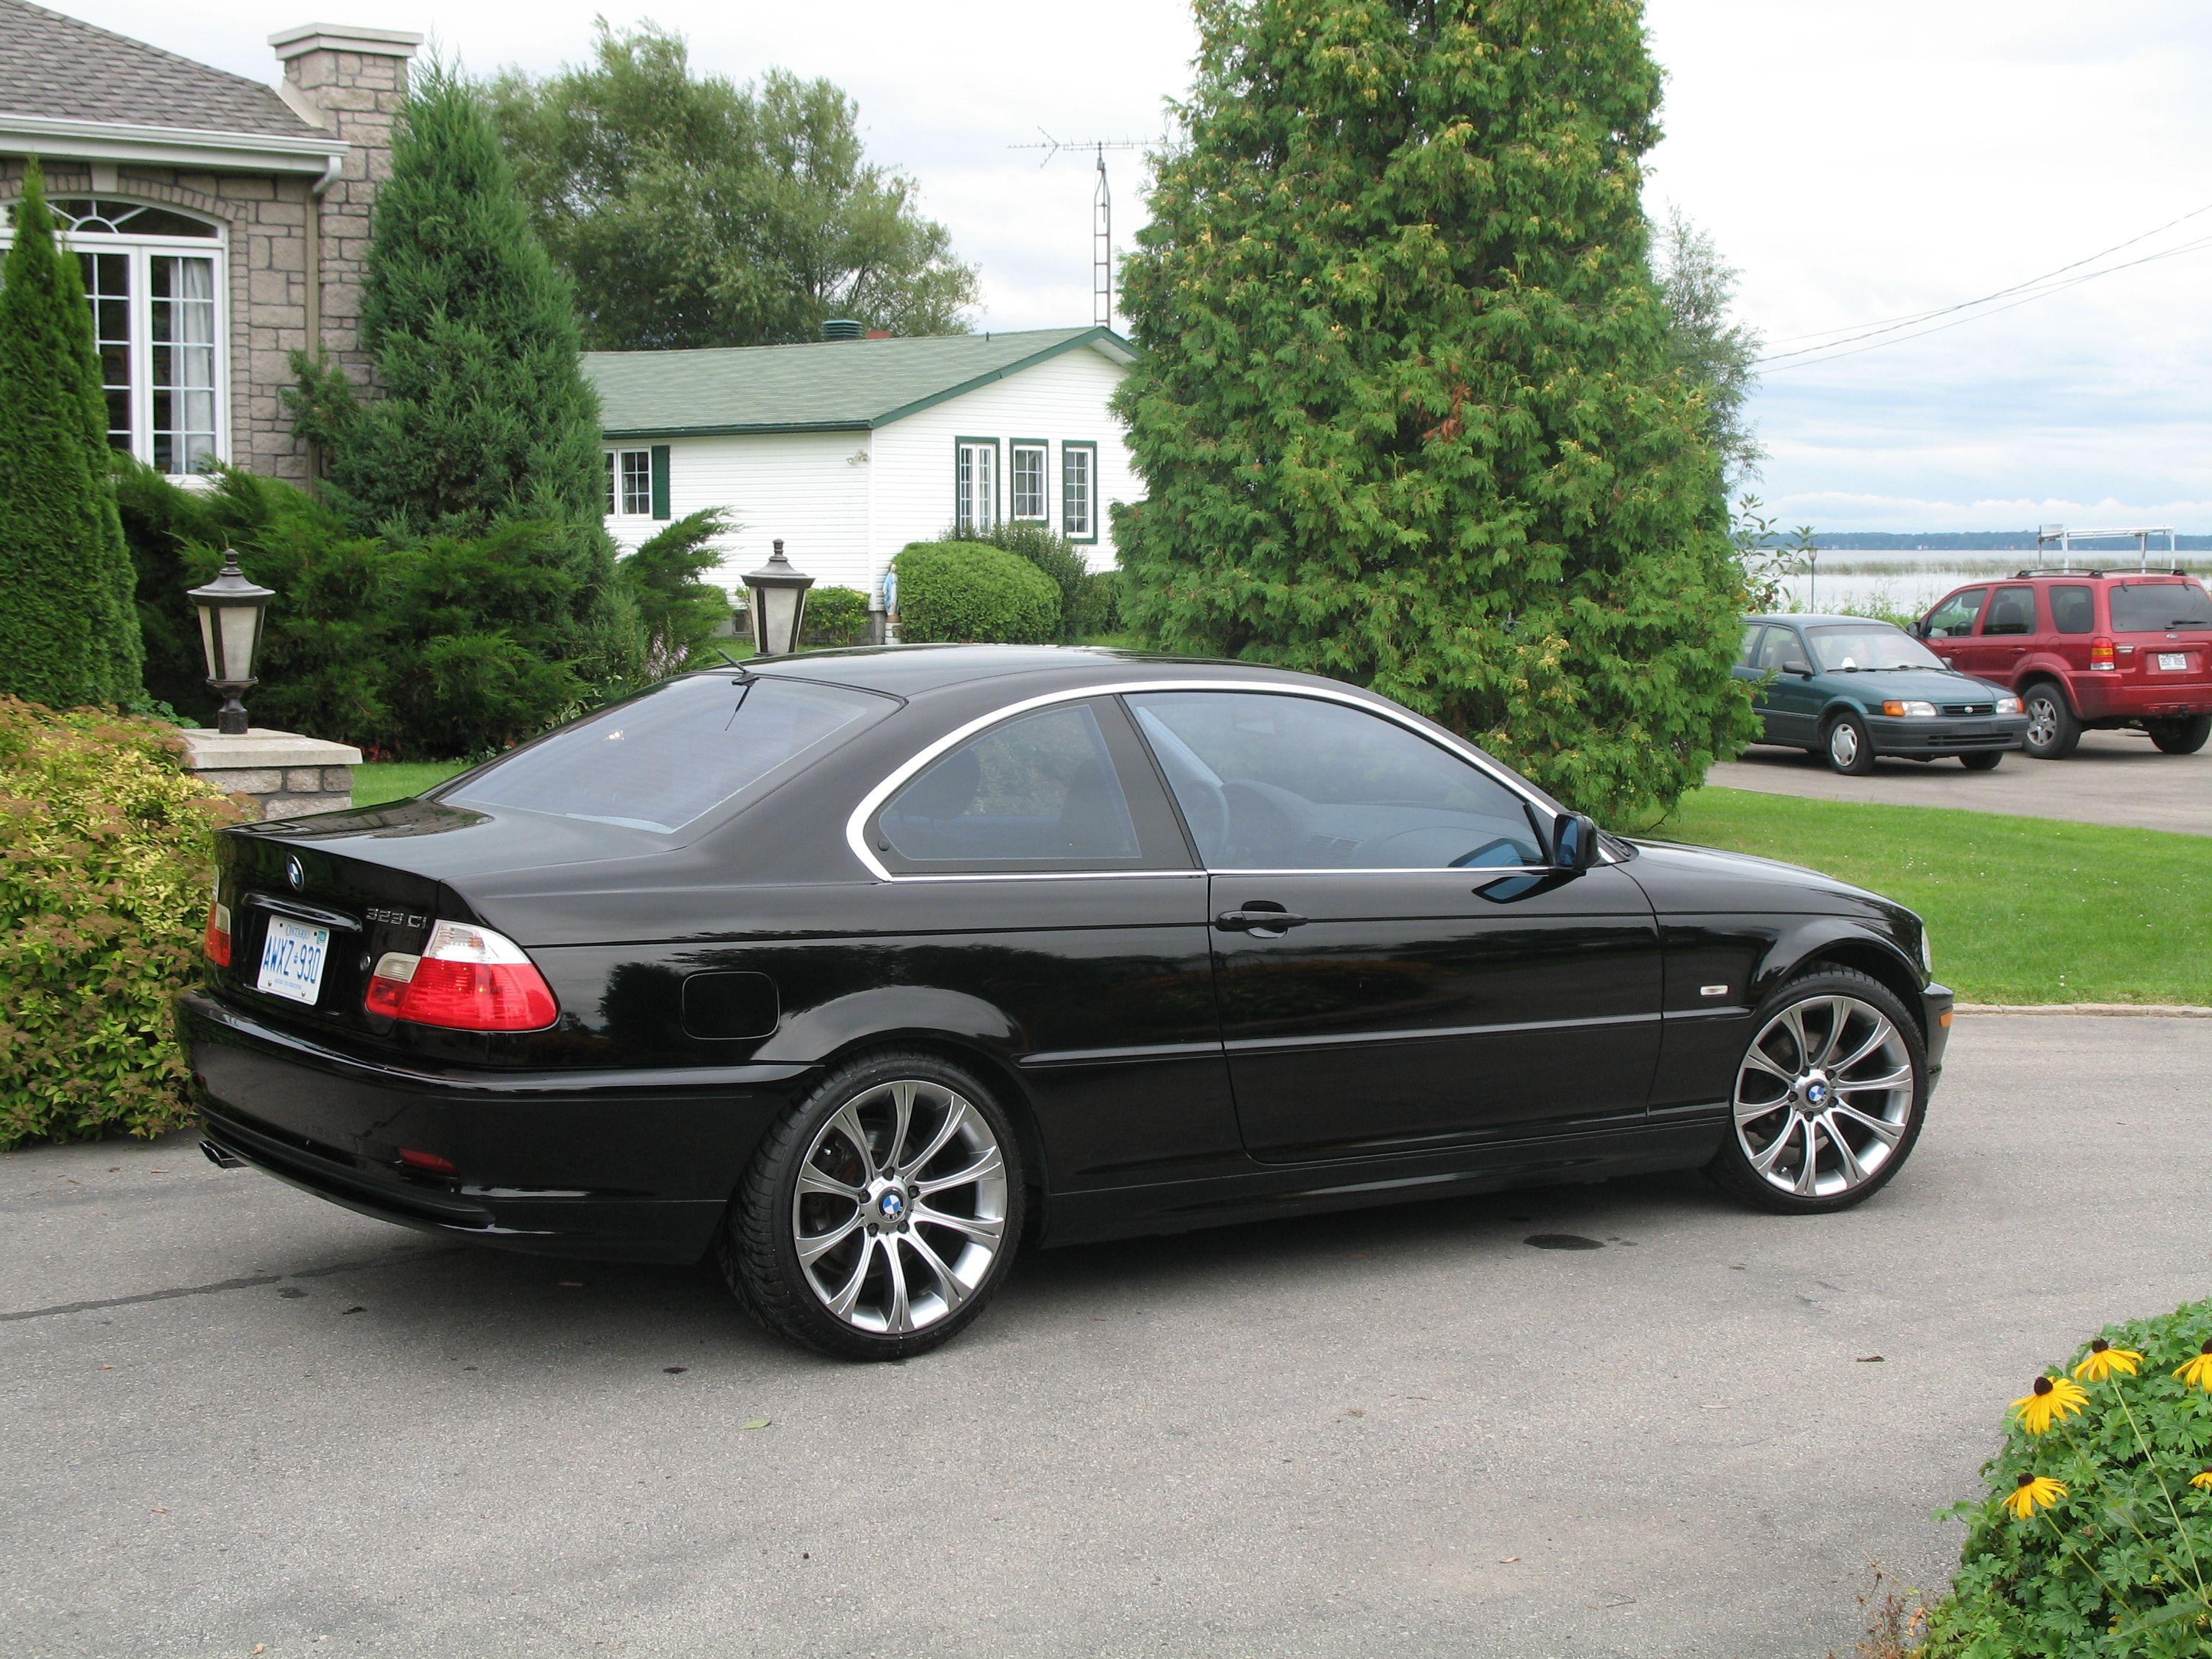 2000 Bmw 323ci Sweet Ride